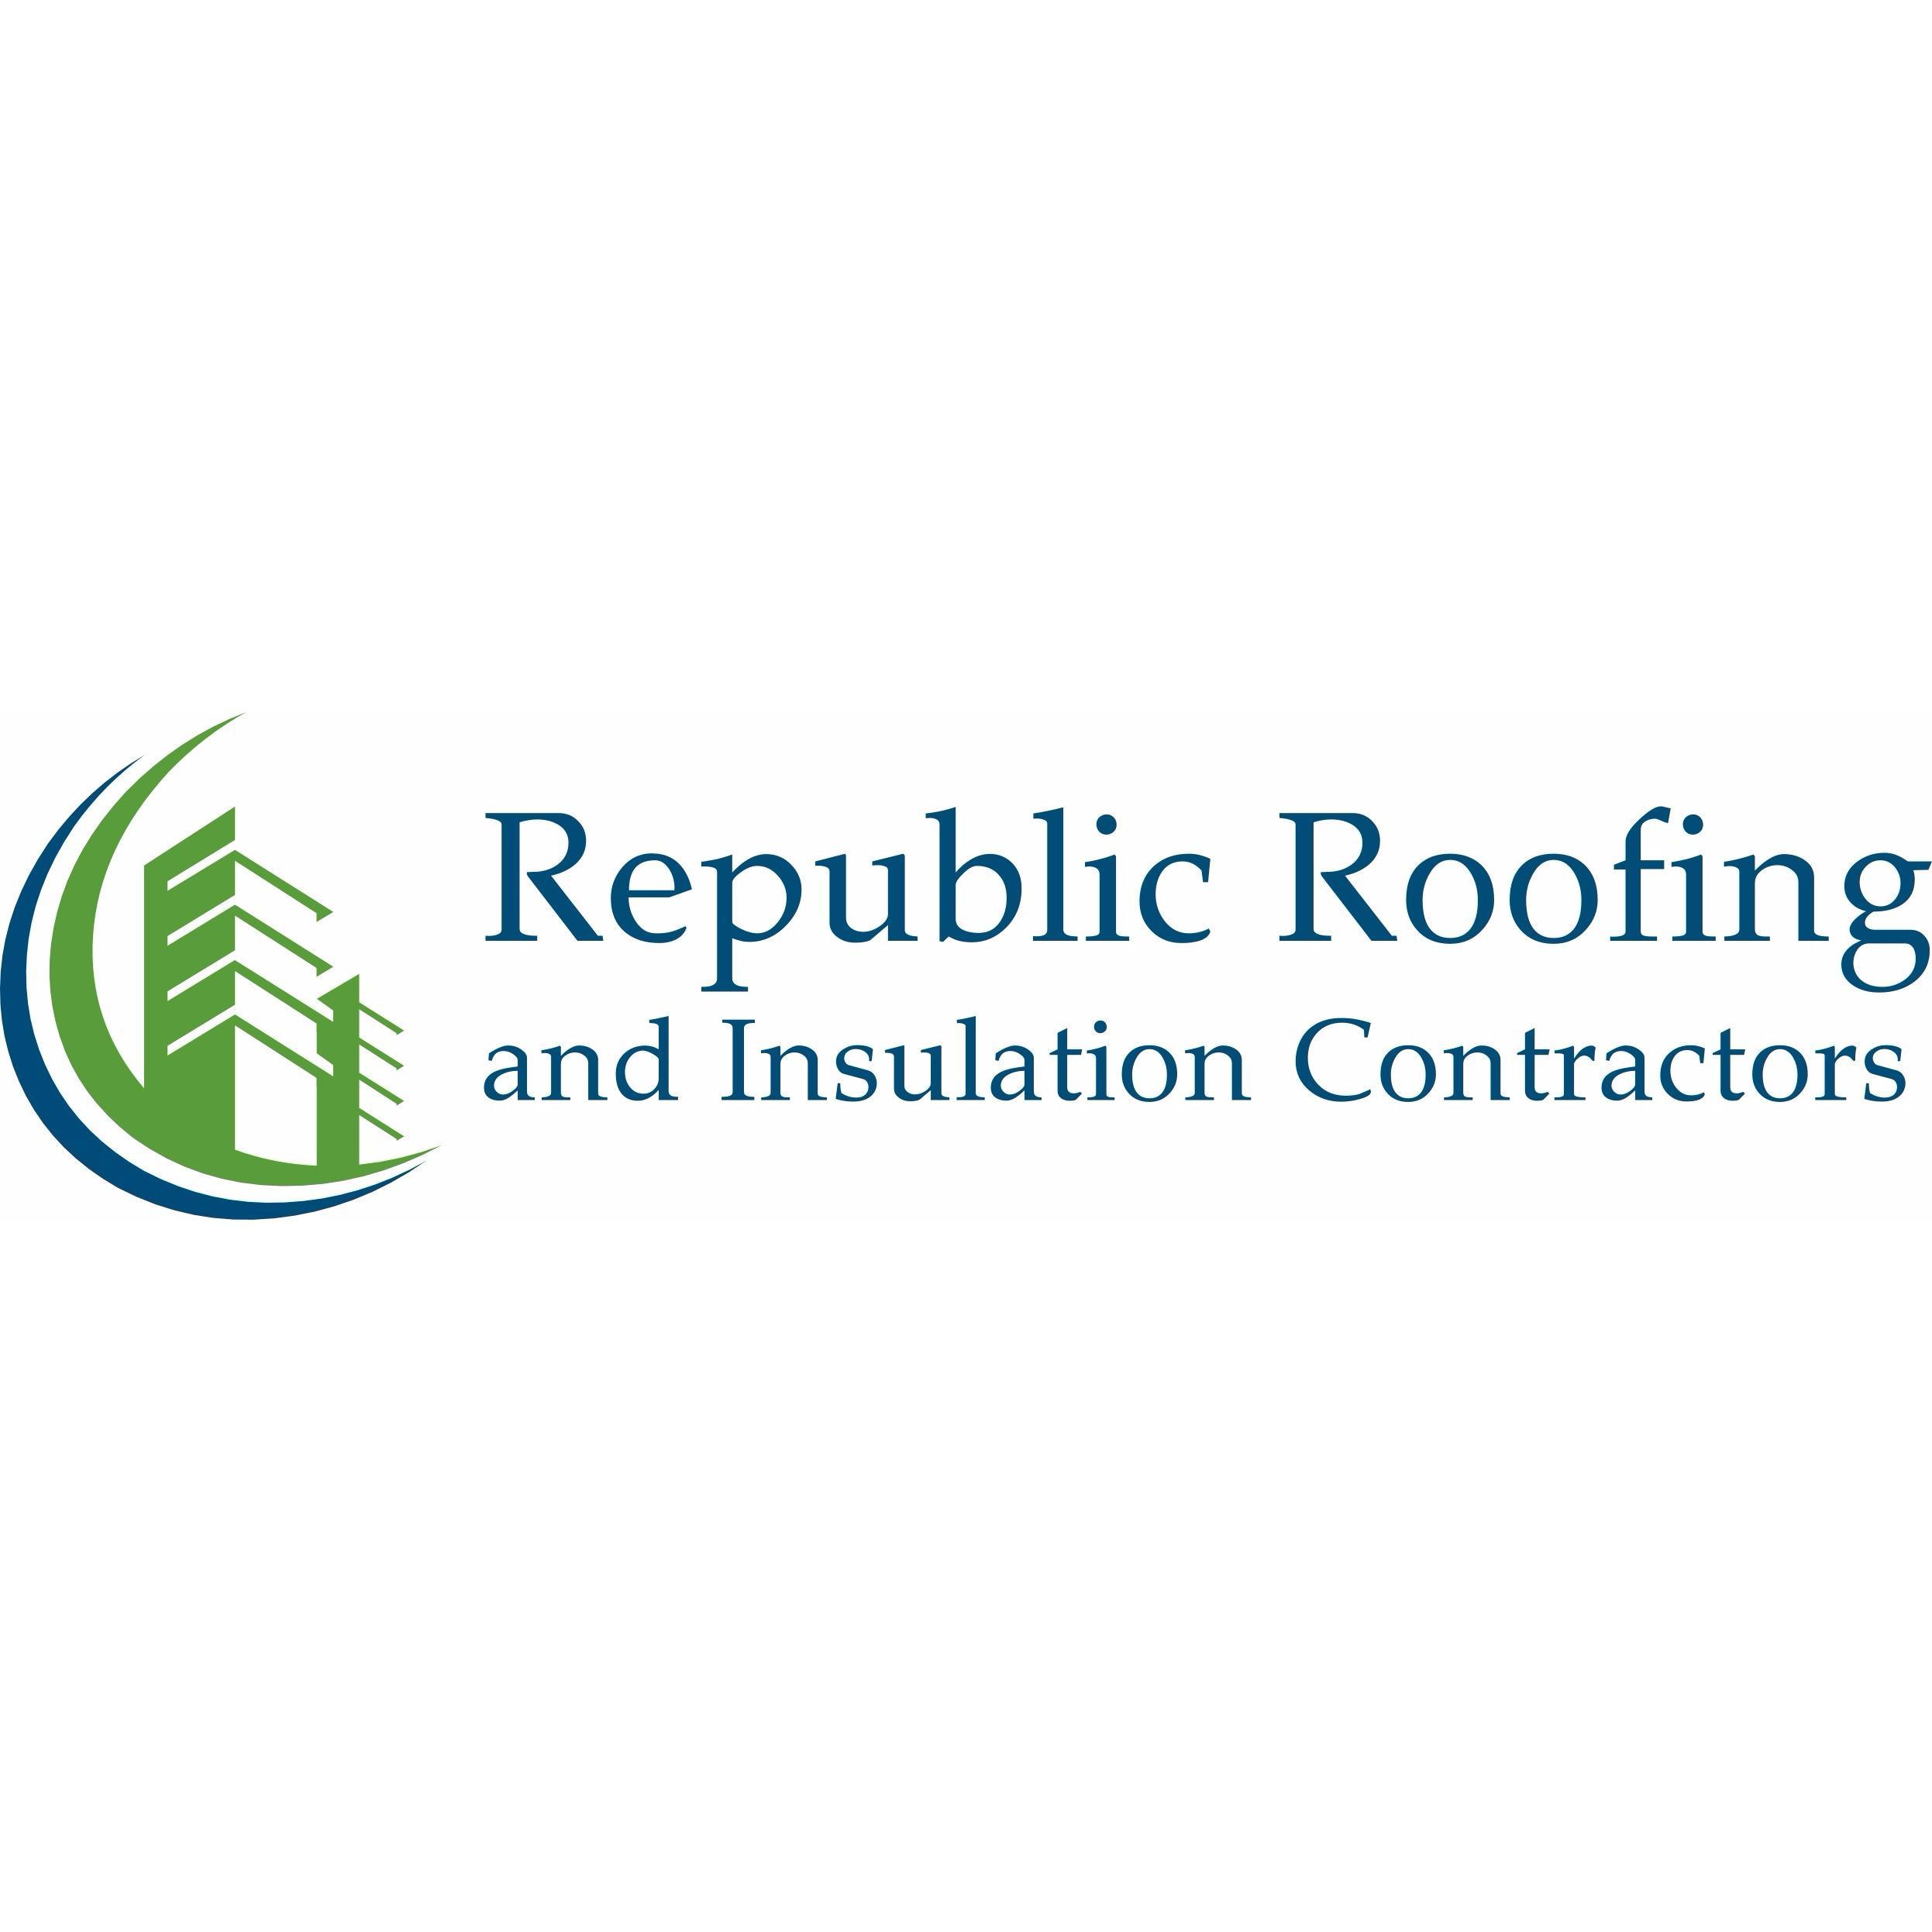 Republic Roofing